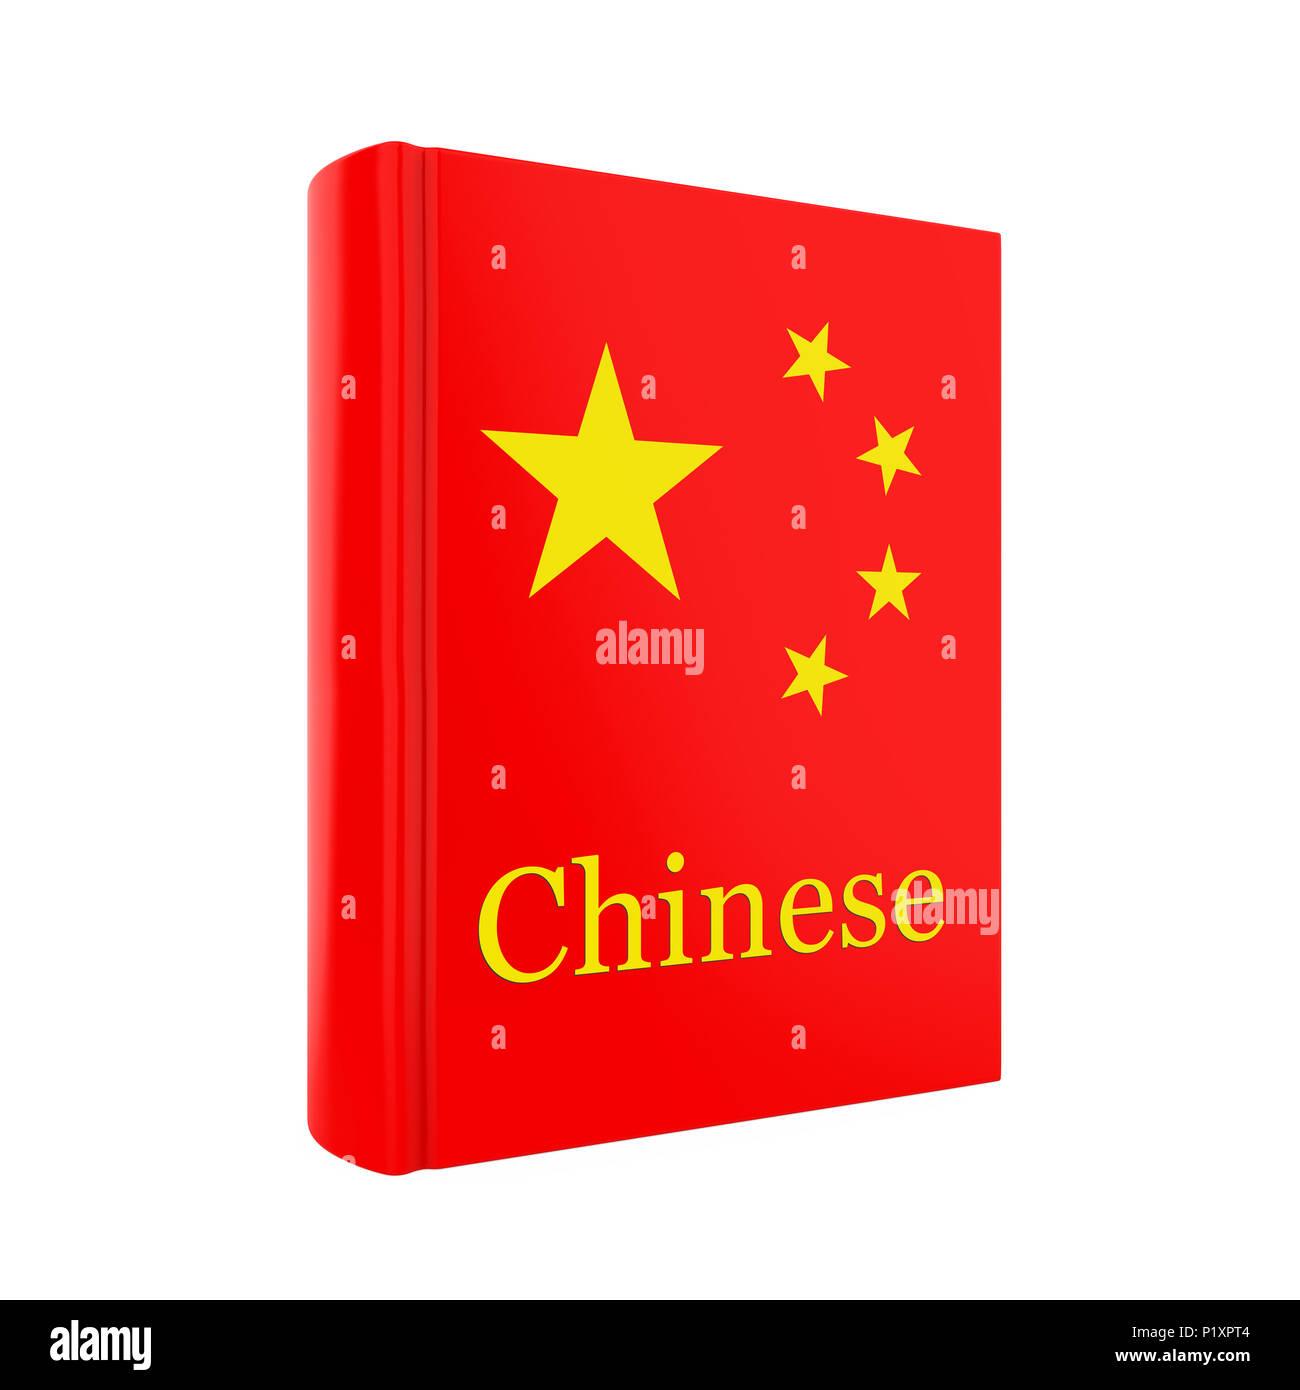 Chinese Language Book Stock Photos & Chinese Language Book